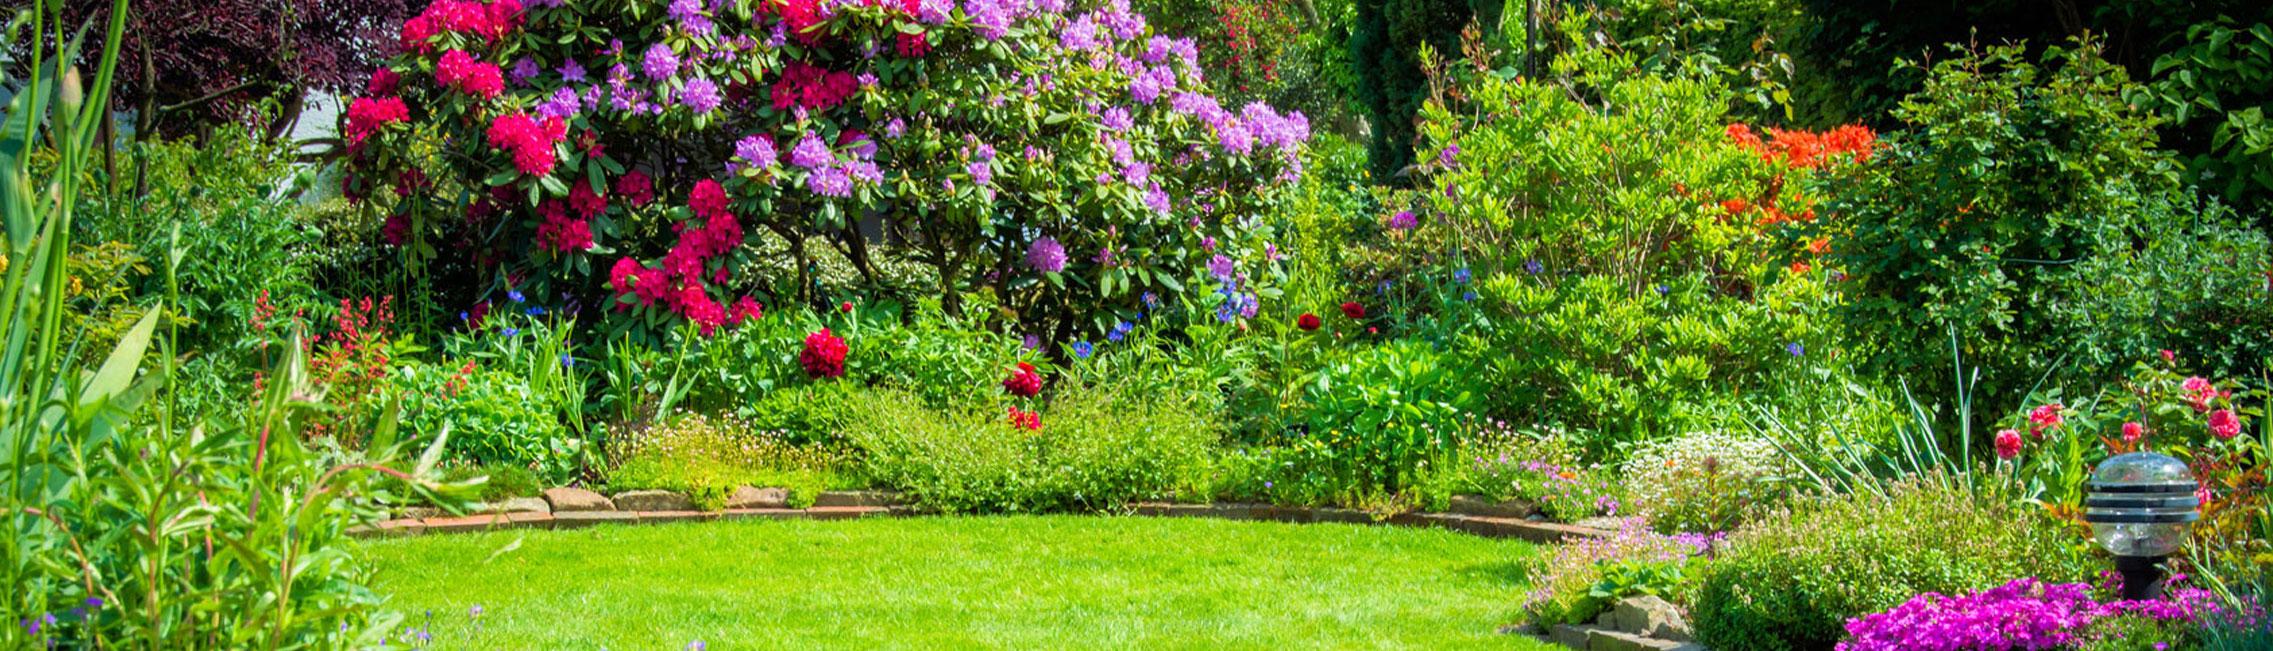 Aidlib entretien jardin cr ation jardins 94 lagage for Entretien jardin 92